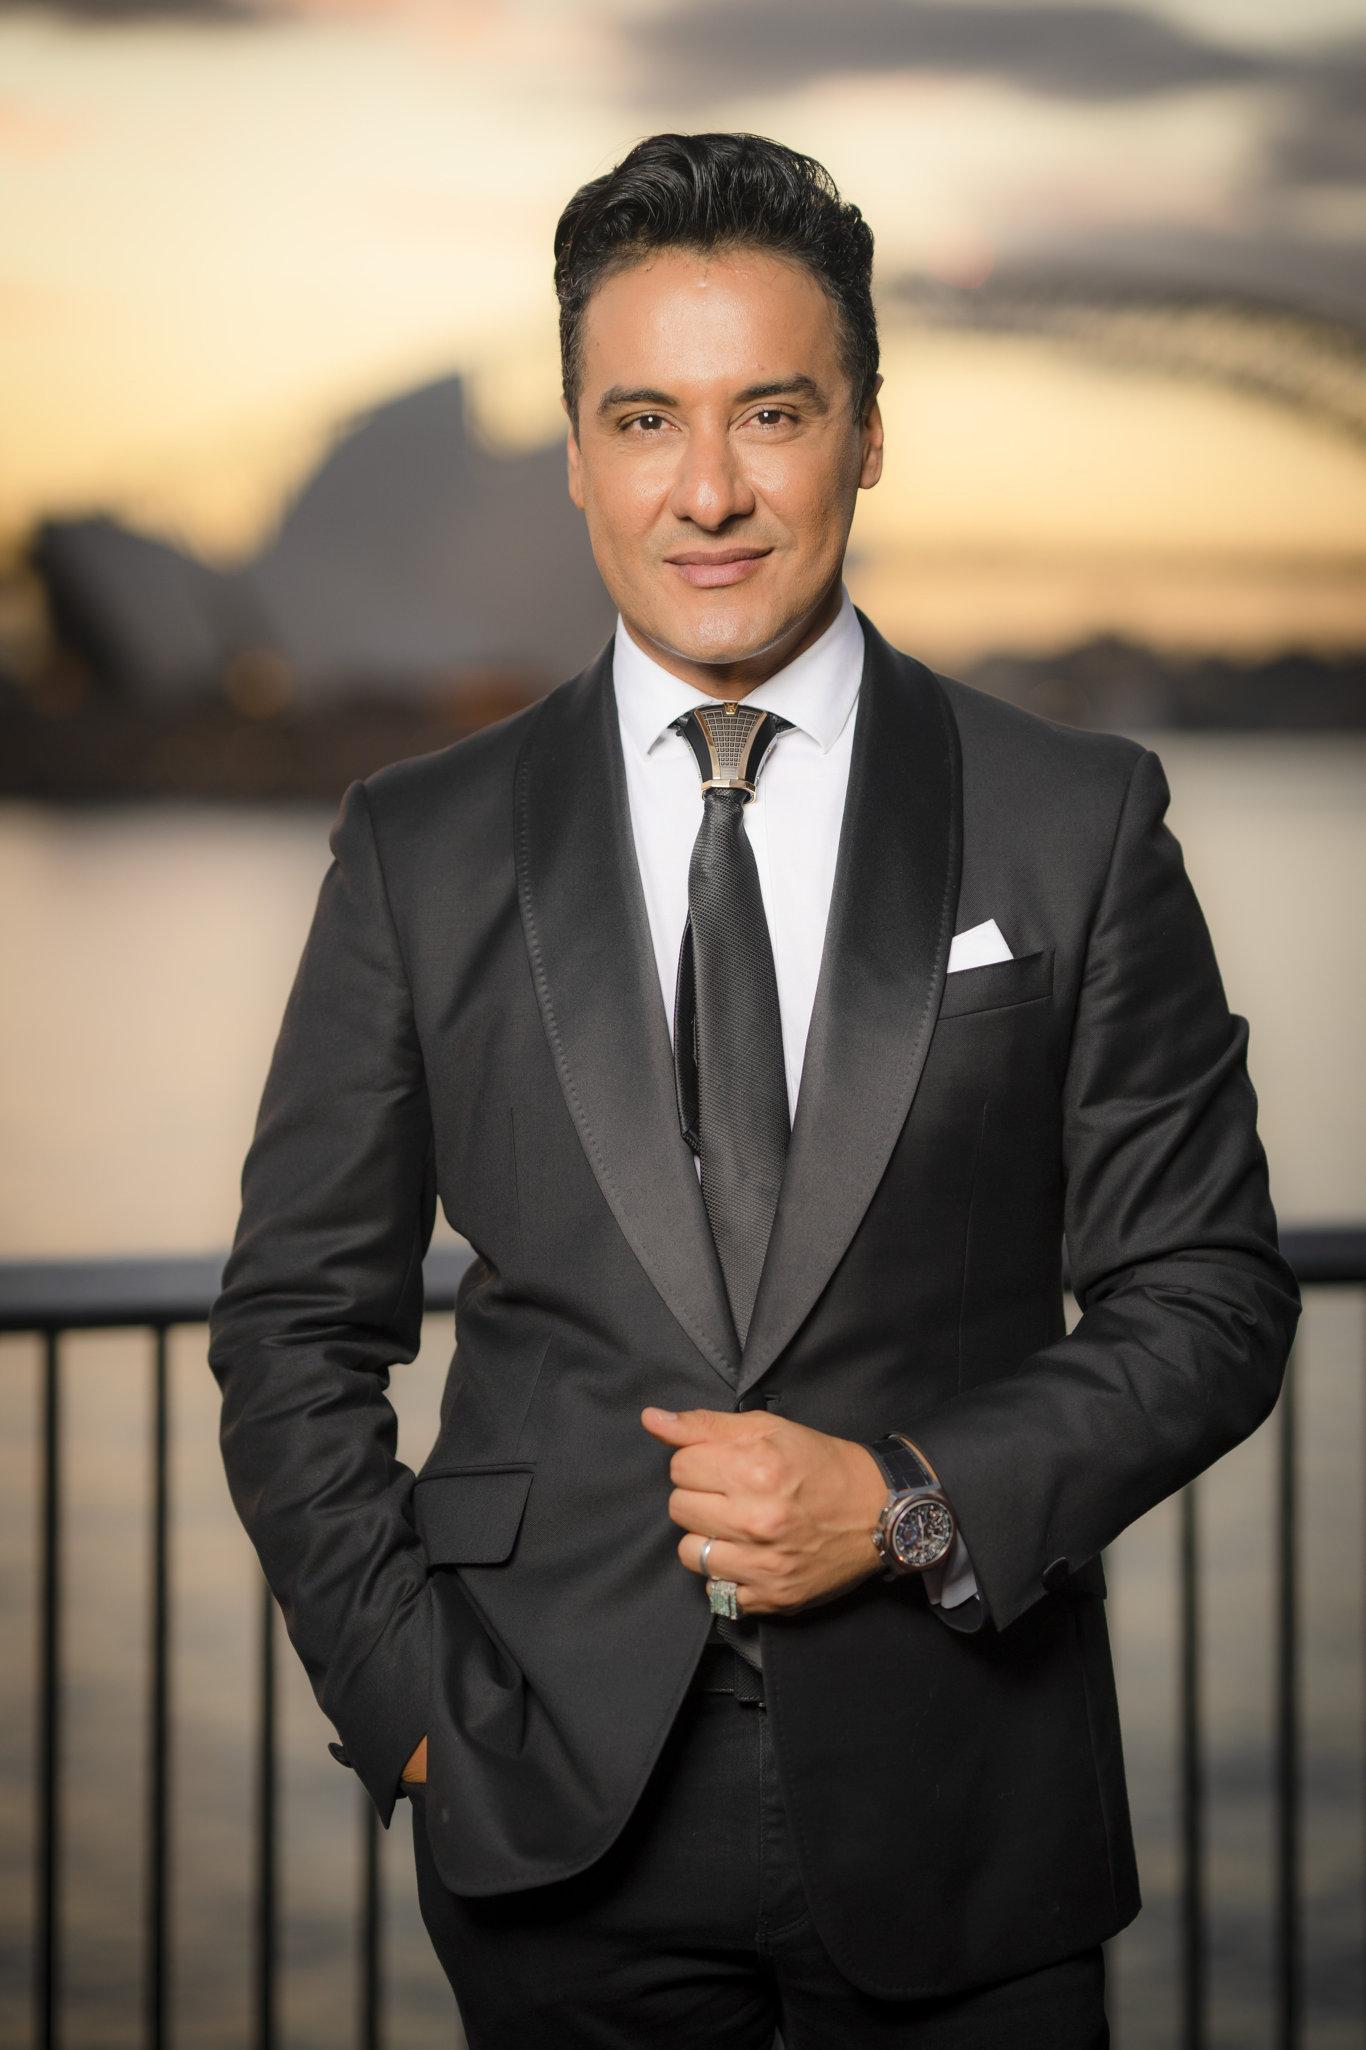 Karim Gharbi, director of The VIP Sydney, stars in Ten's new Pilot Week show Sydney's Crazy Rich Asians.